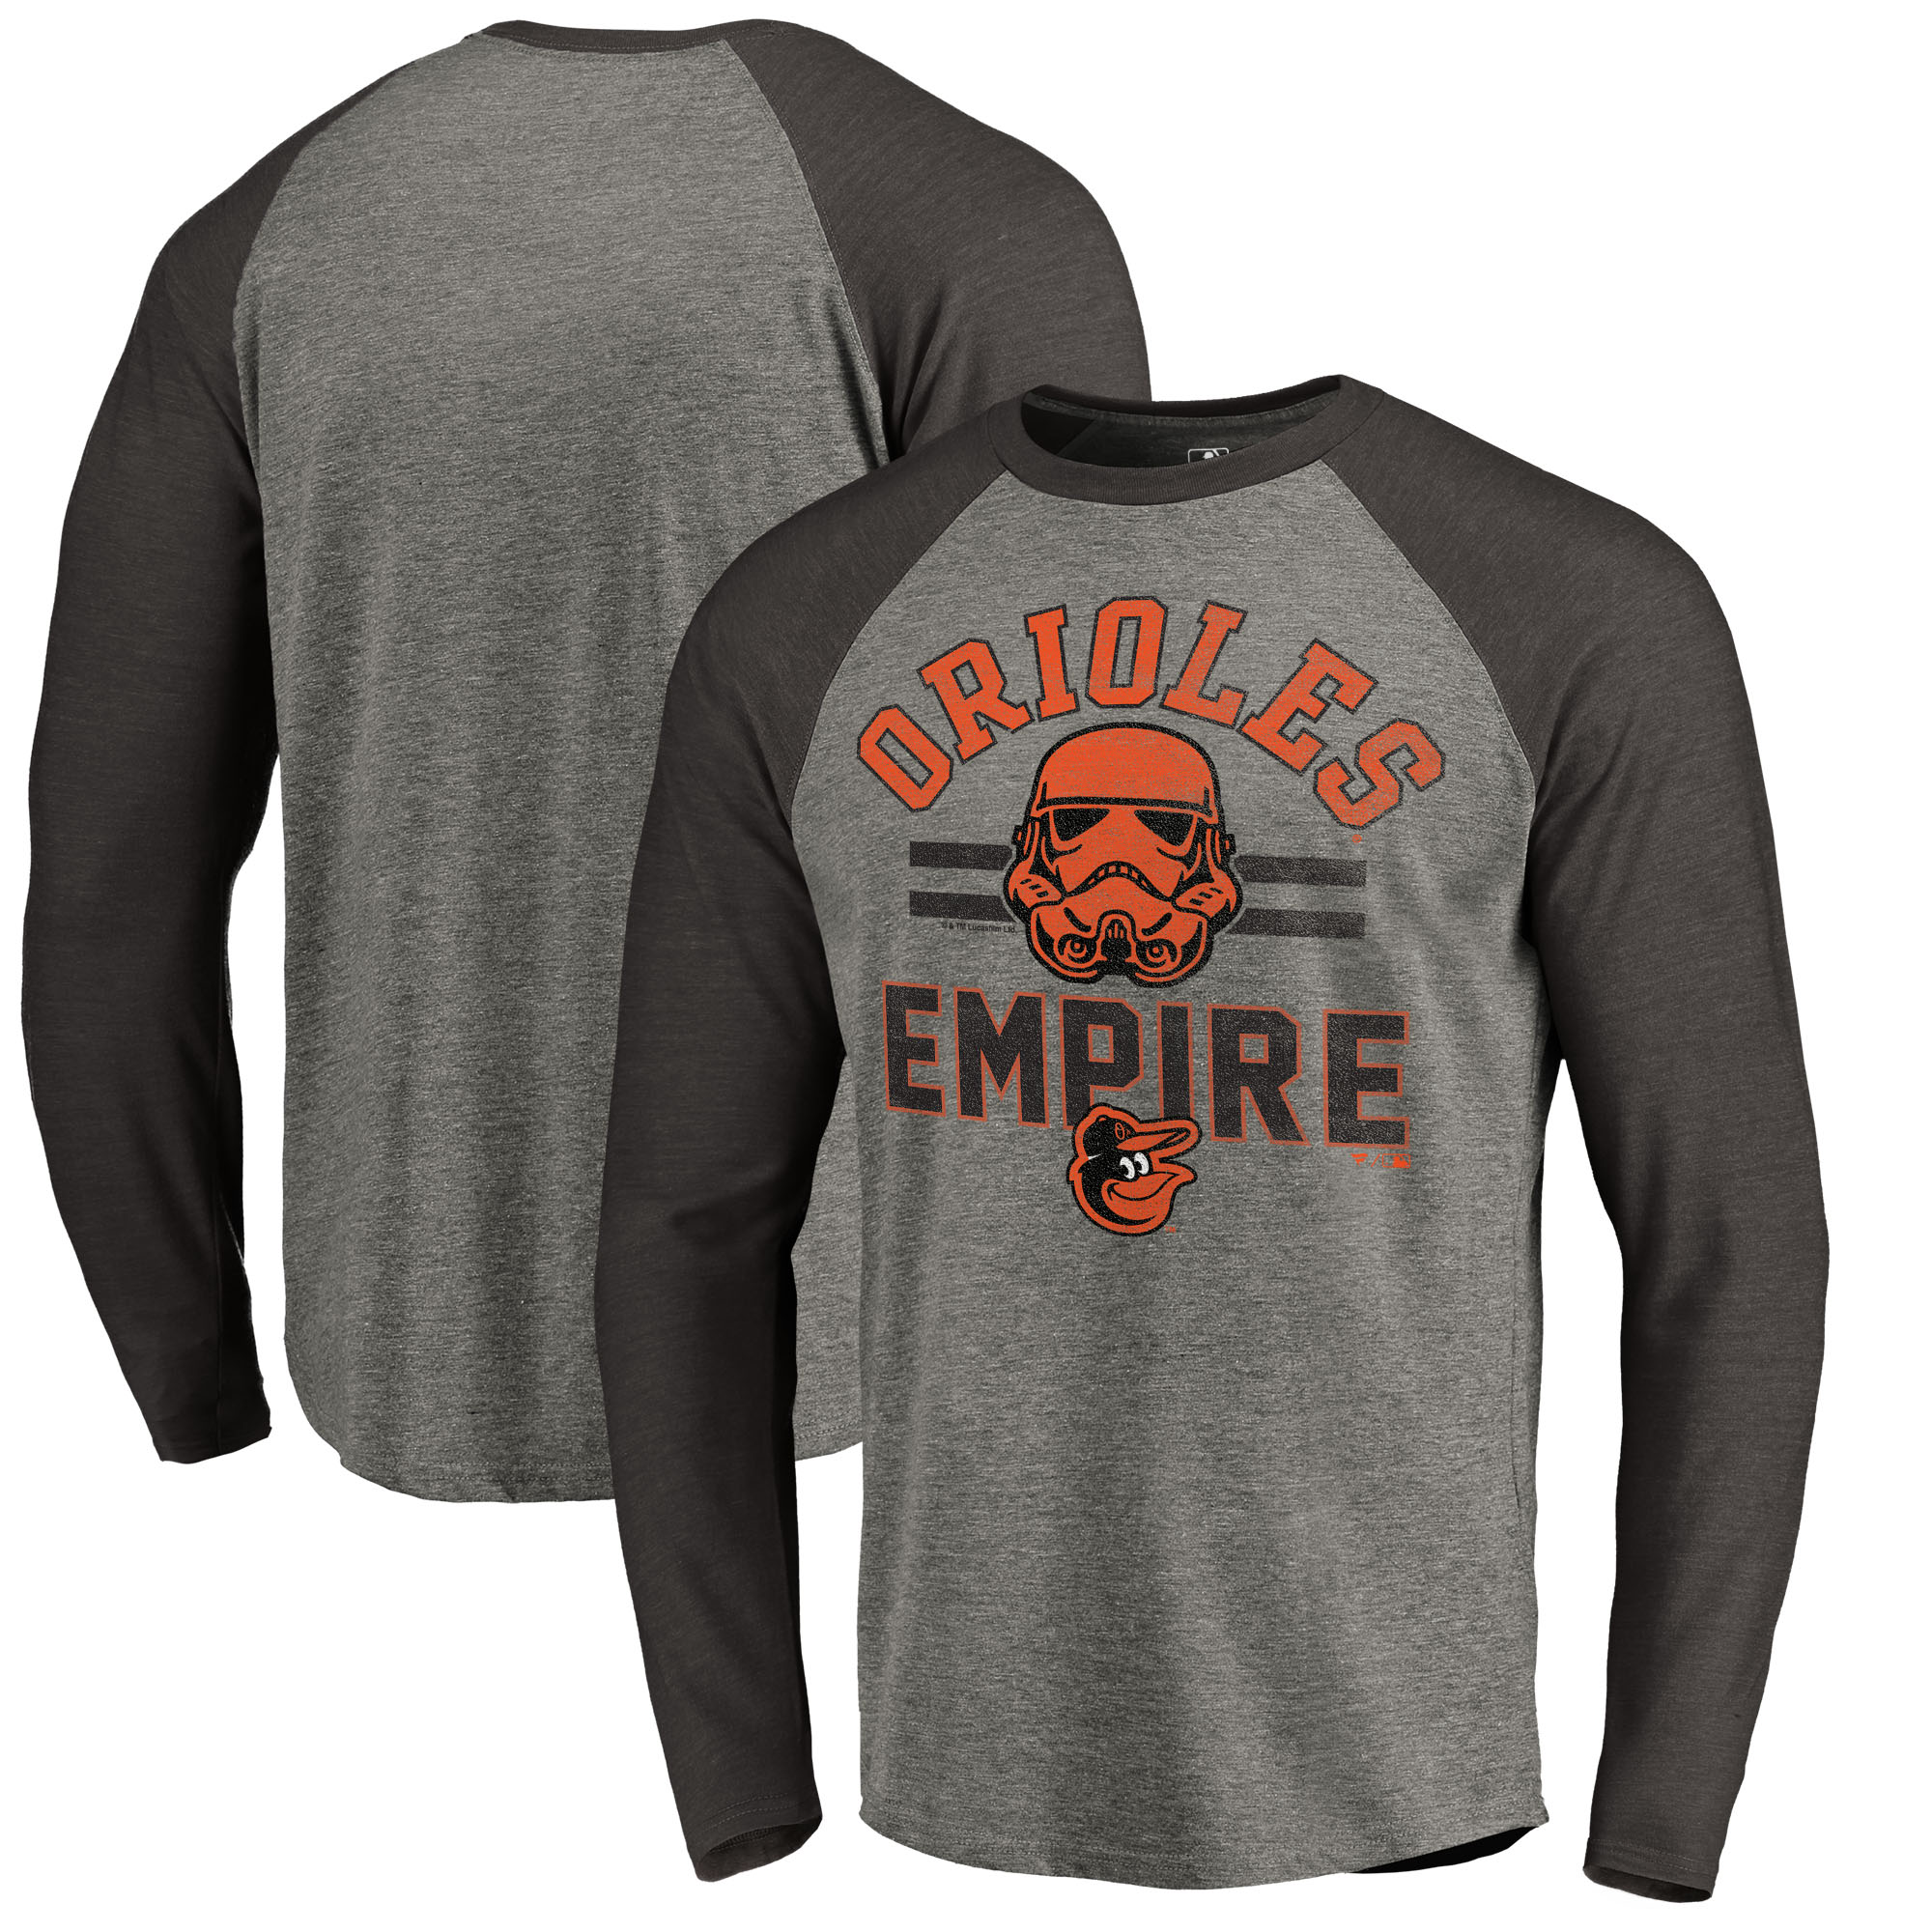 Baltimore Orioles Fanatics Branded MLB Star Wars Empire Raglan Long Sleeve T-Shirt - Heather Gray